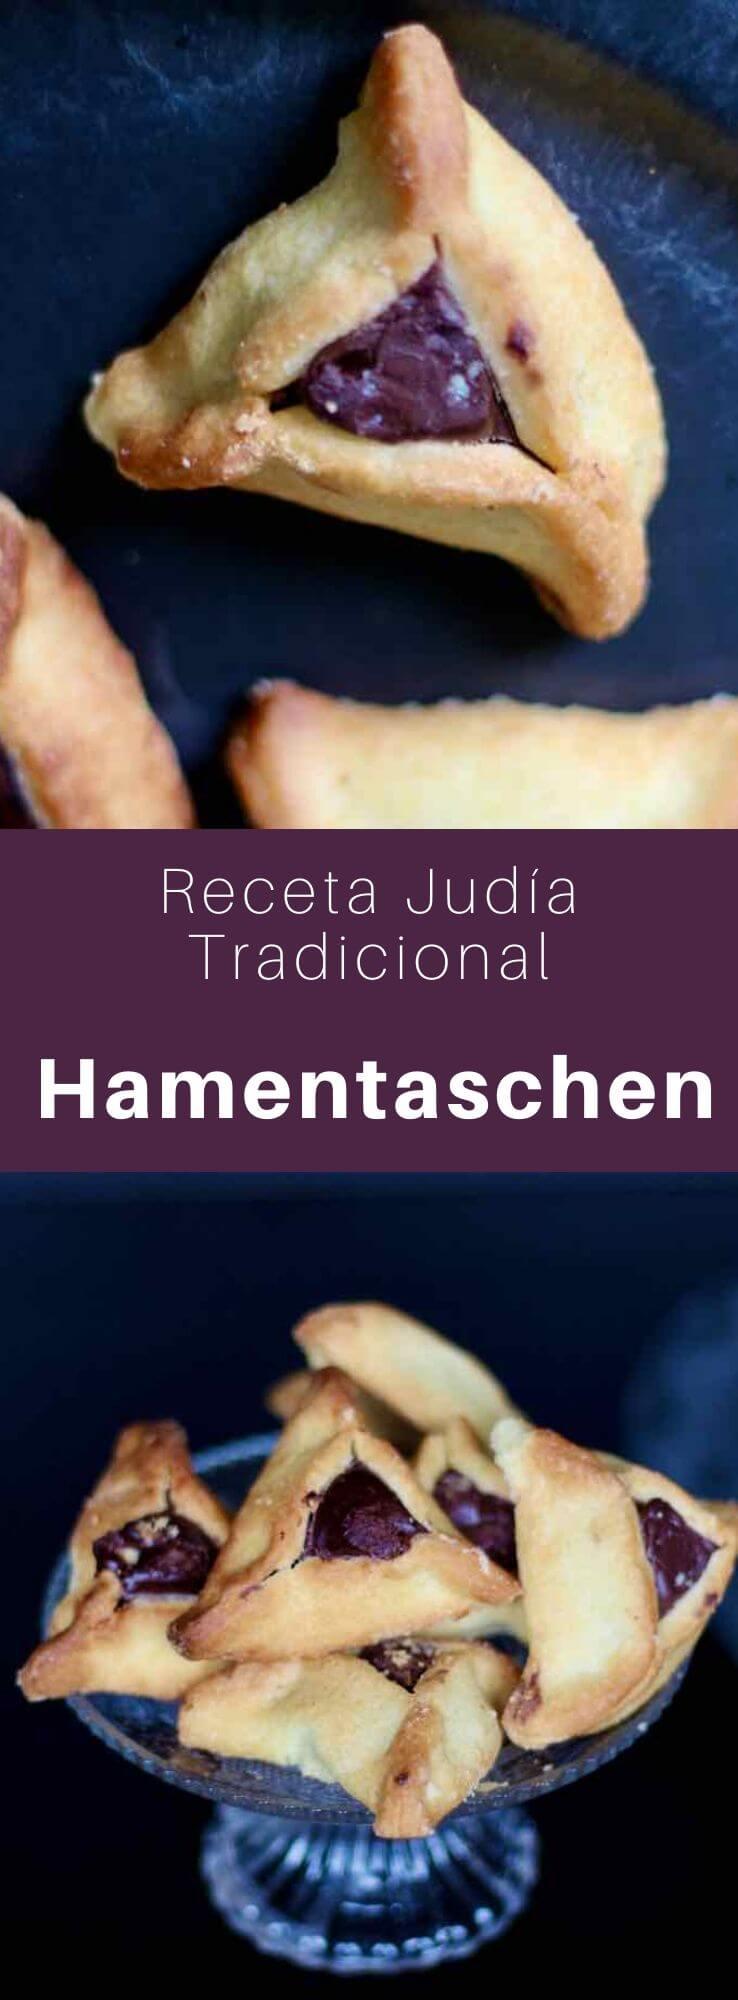 Los hamentaschen o oznei Haman (